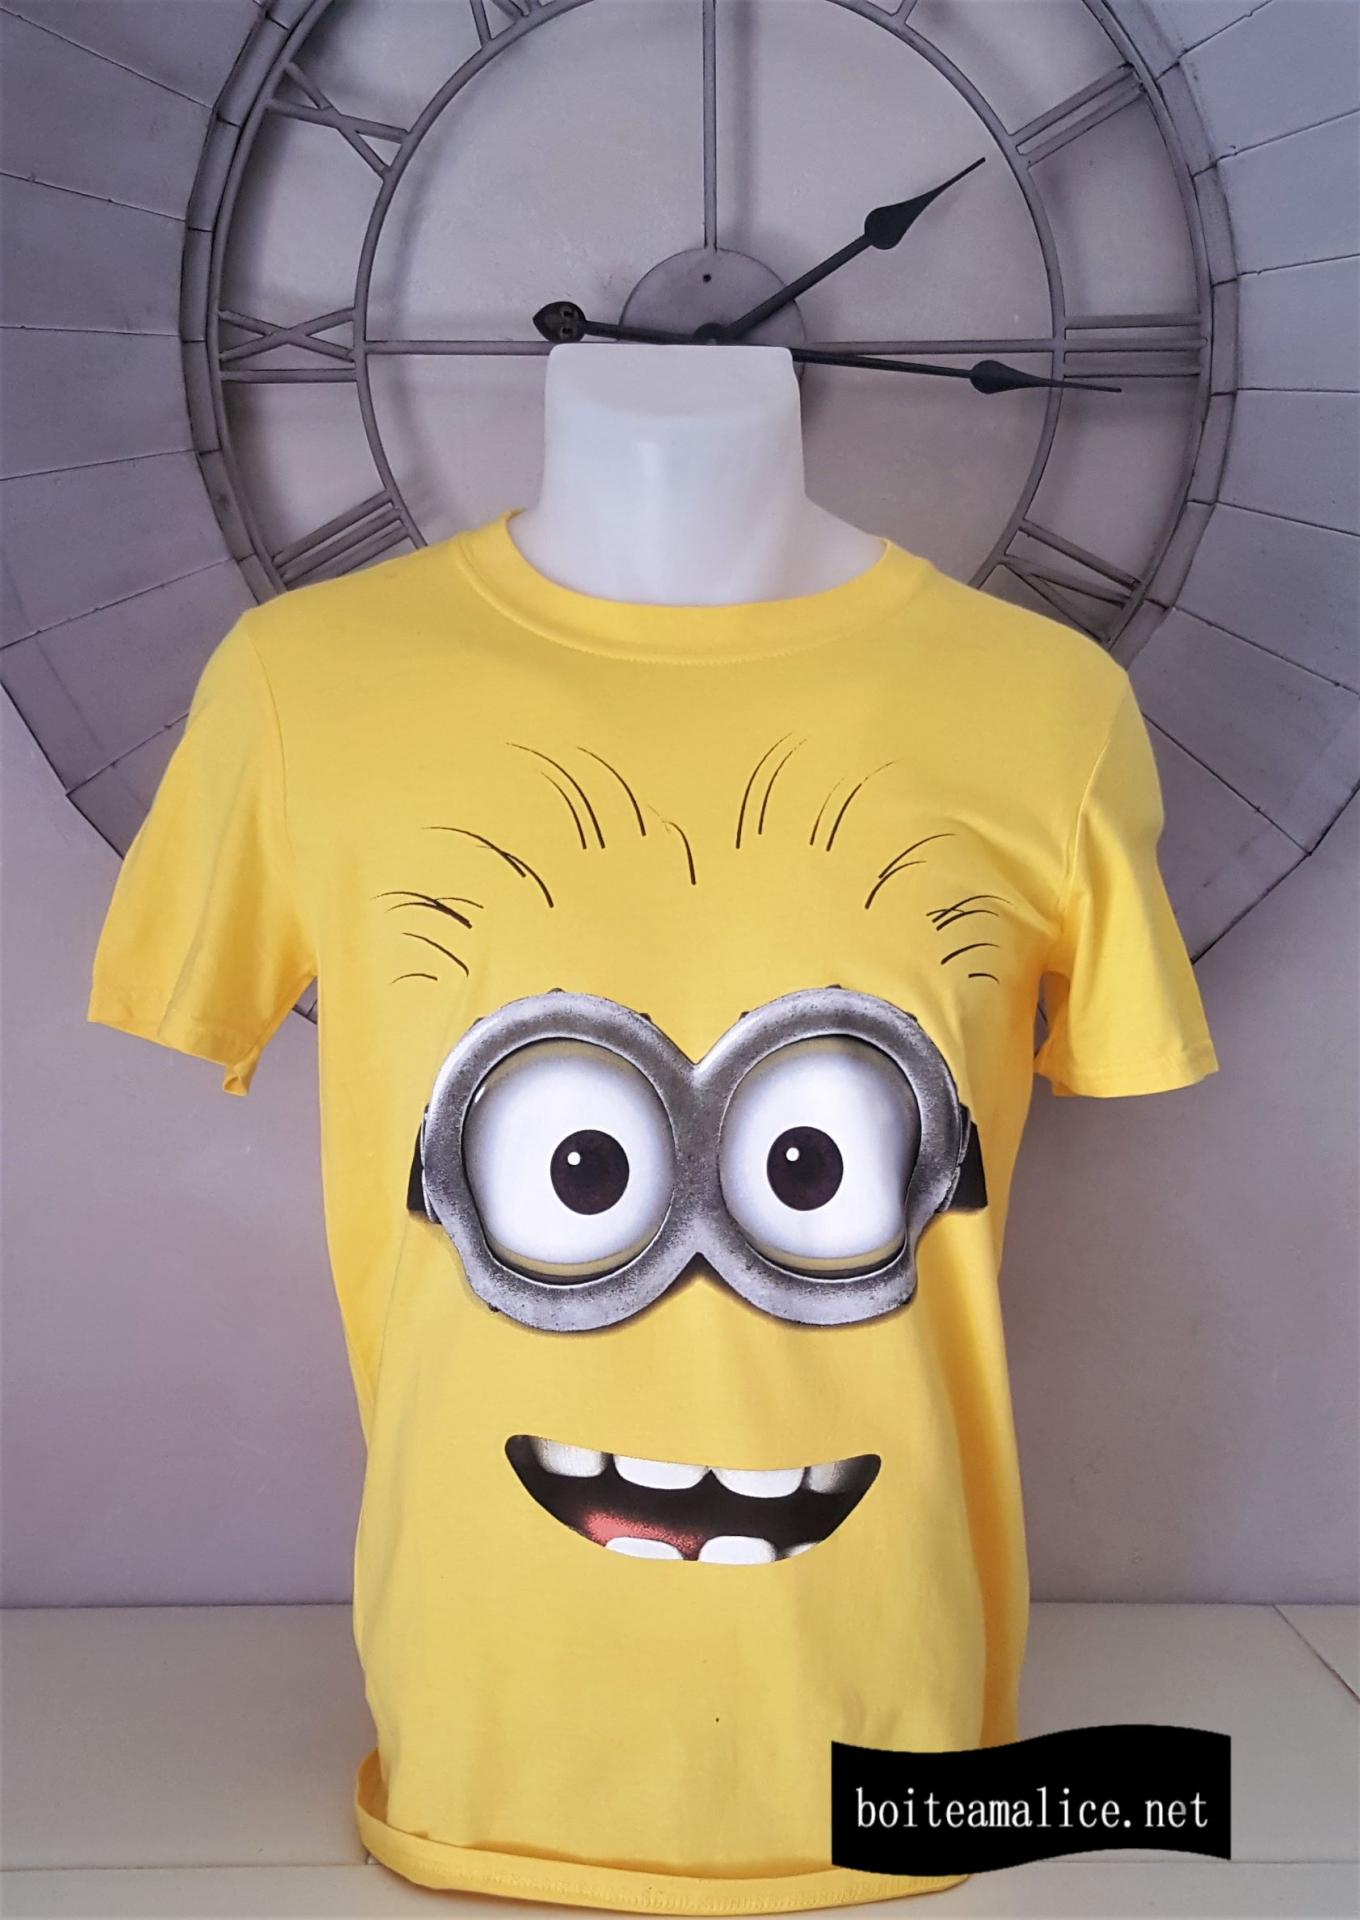 Tshirt mignon